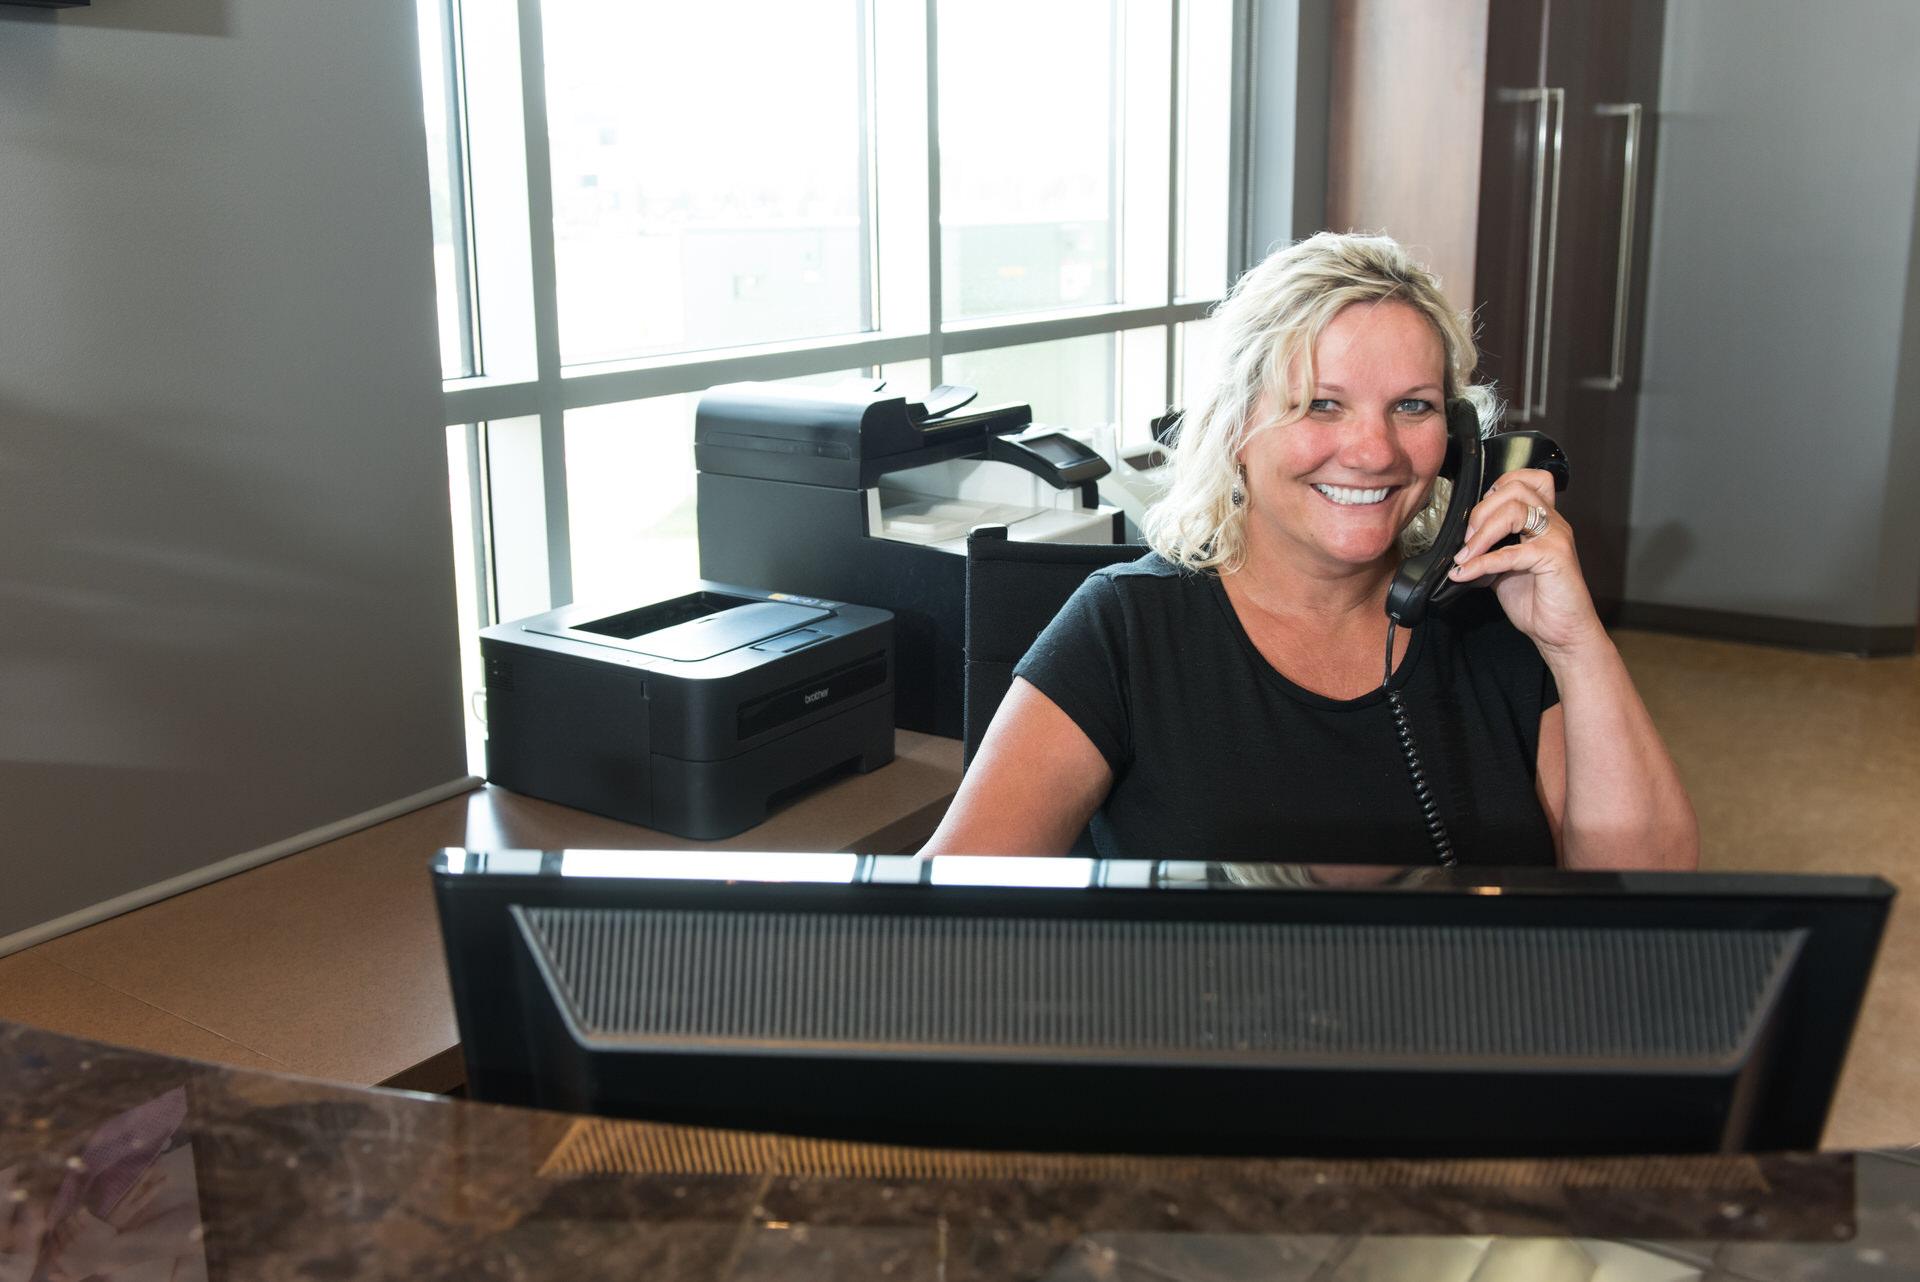 dental-staff-answering-phone-call